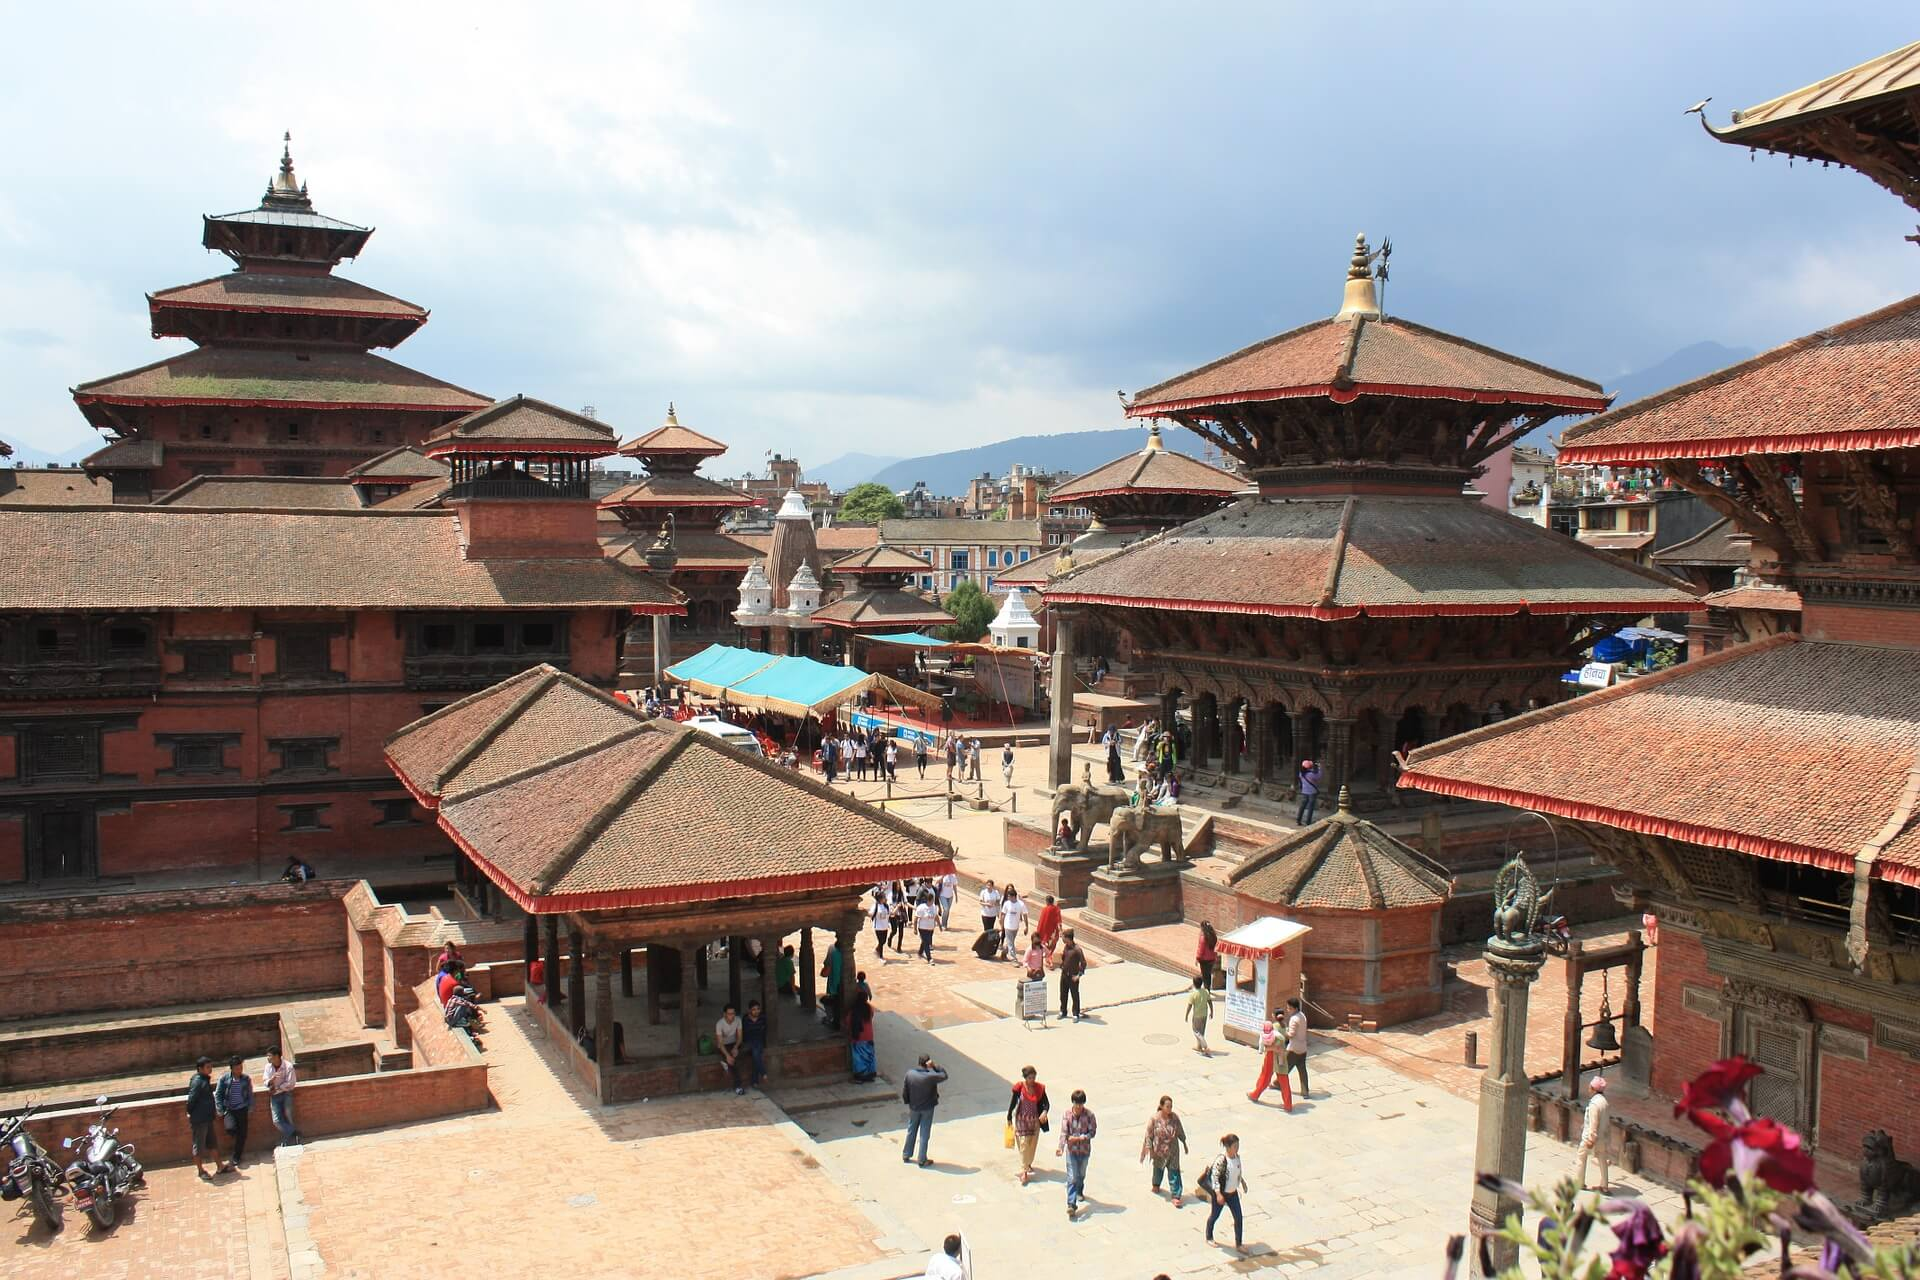 Kathmandu Durbar Squares (Palaces)